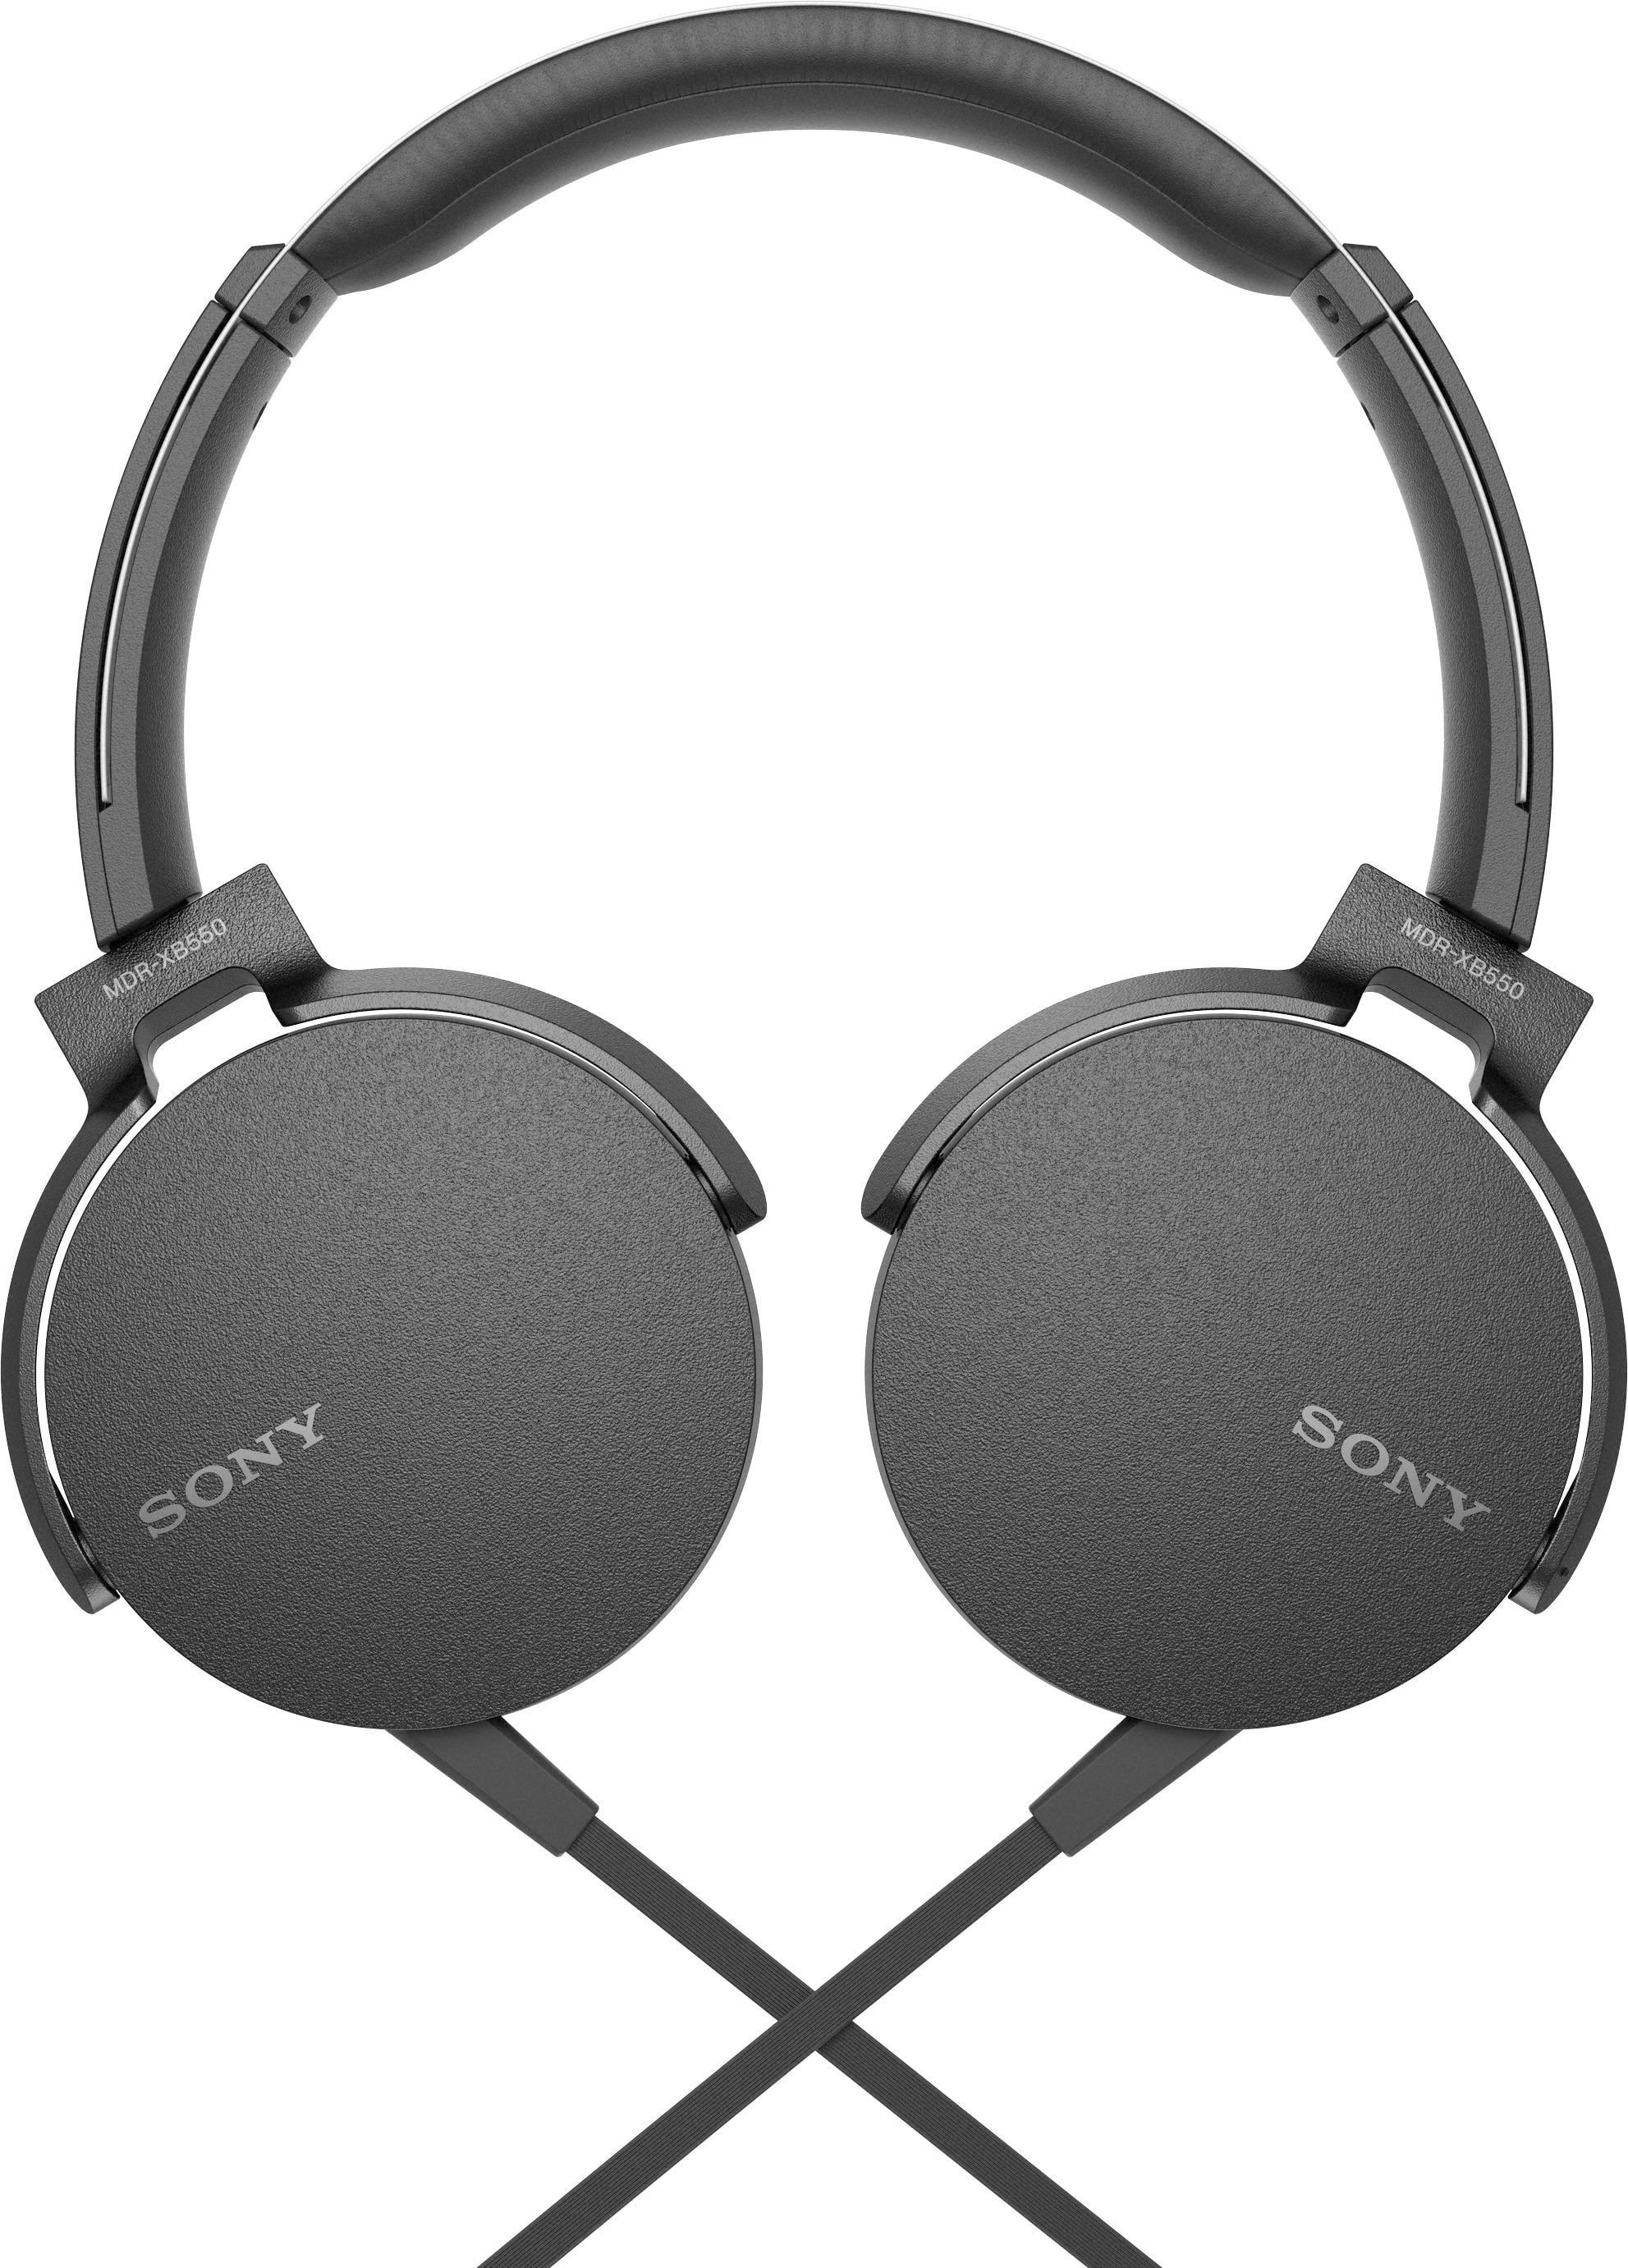 SONY ON EAR HEADPHONES 30MM DRIVERS